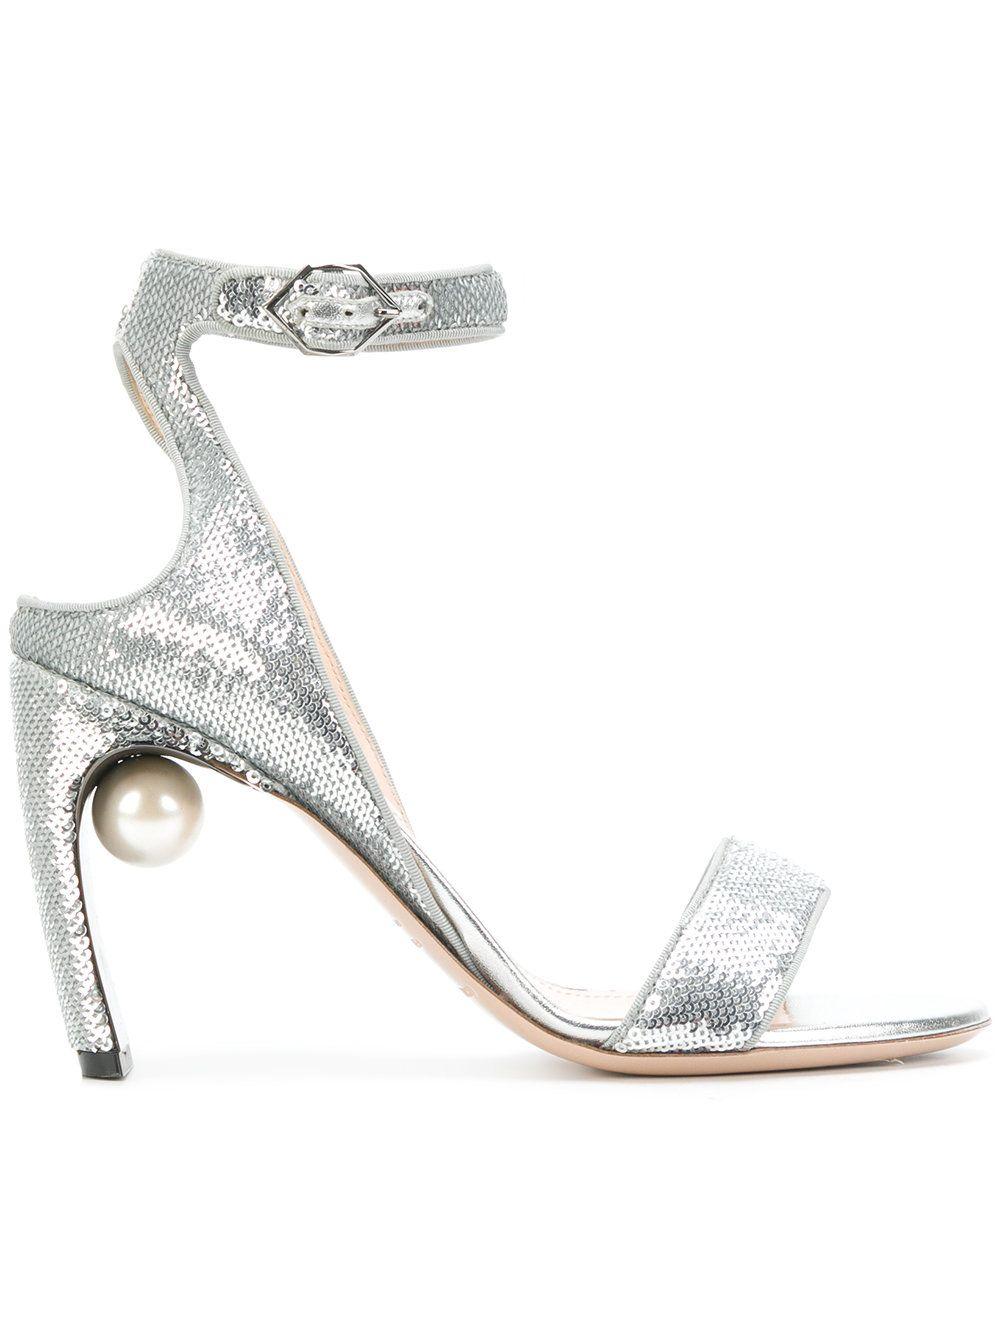 Lola pearl sandals - Metallic Nicholas Kirkwood LBFip